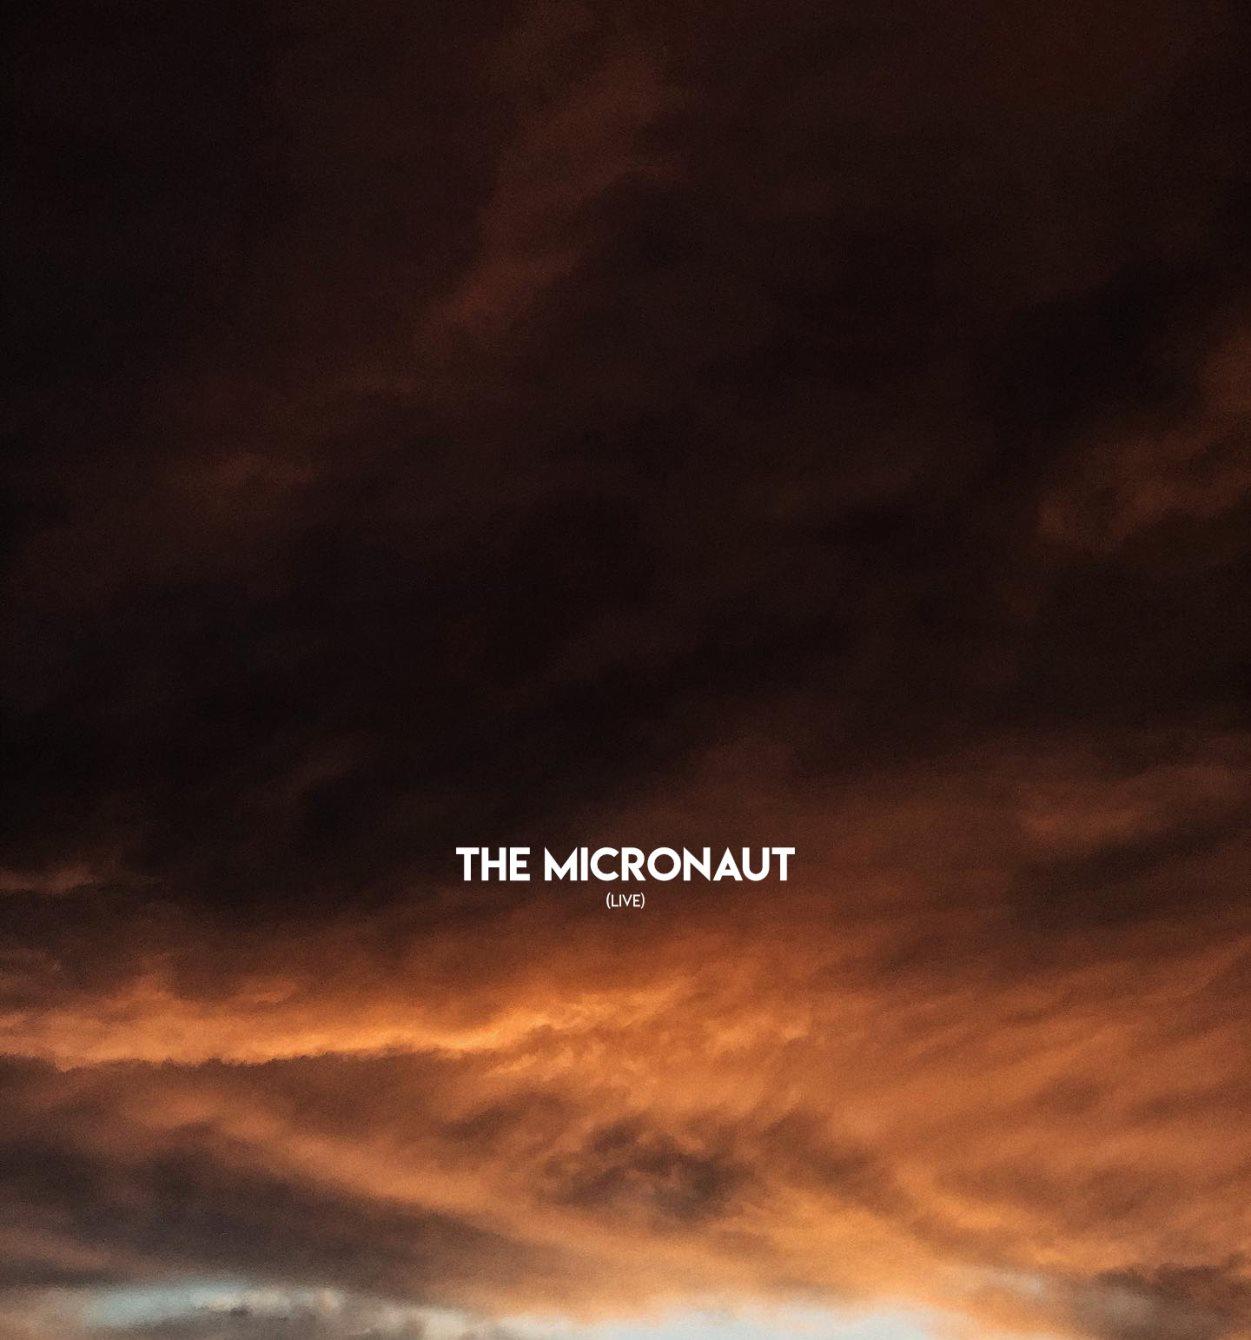 The Micronaut